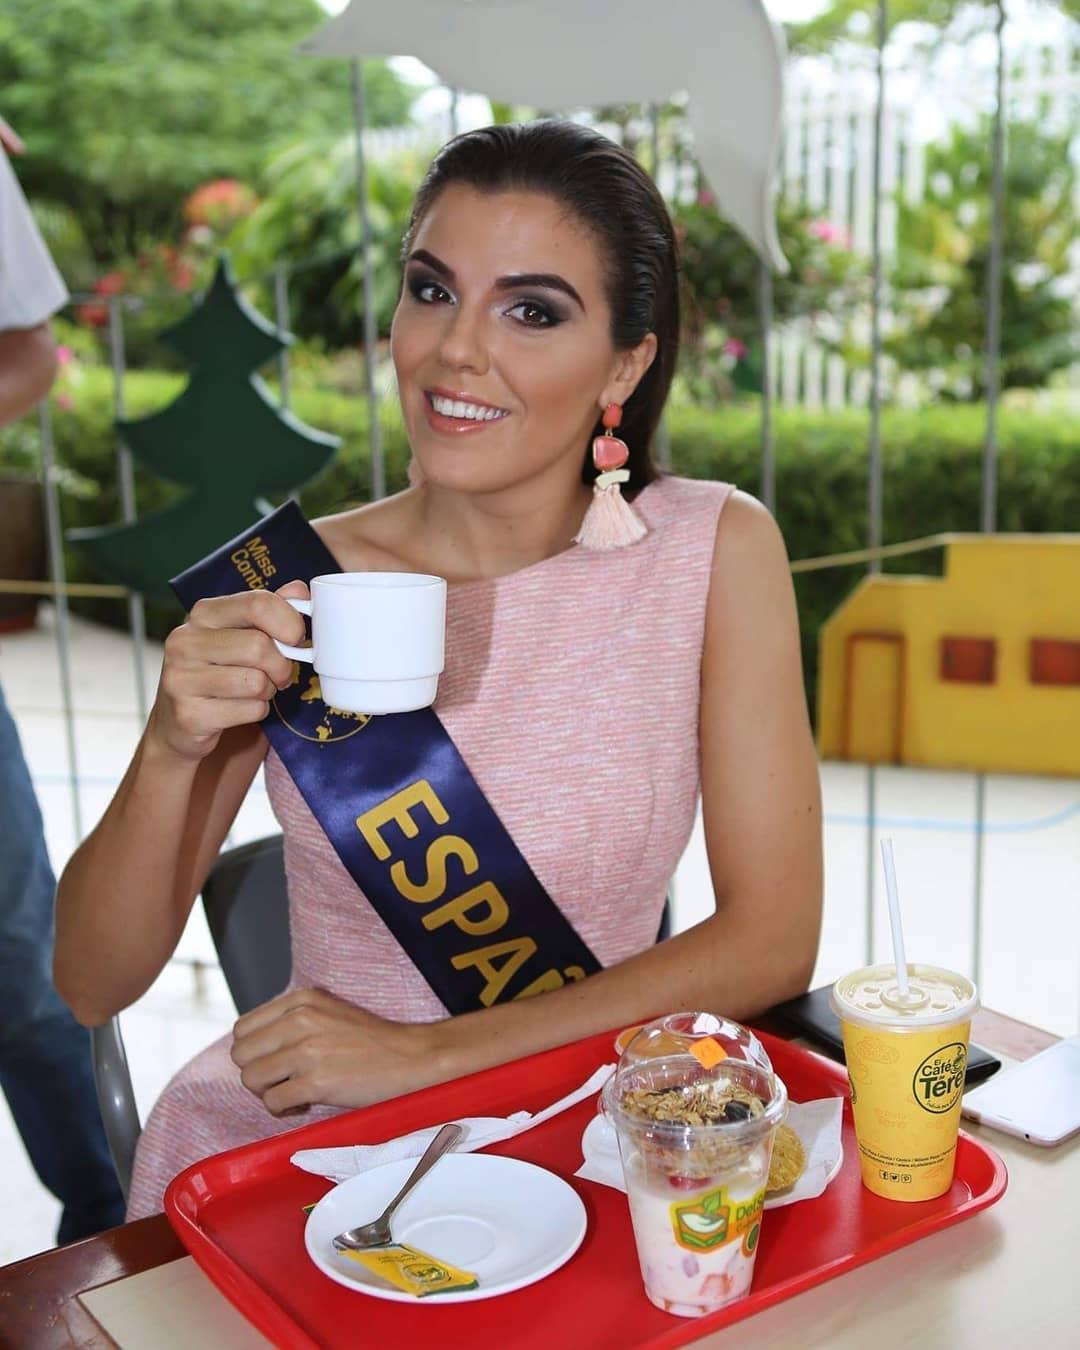 cynthia ruz lopez escobar, 3rd runner-up de miss continentes unidos 2018. - Página 3 40491310